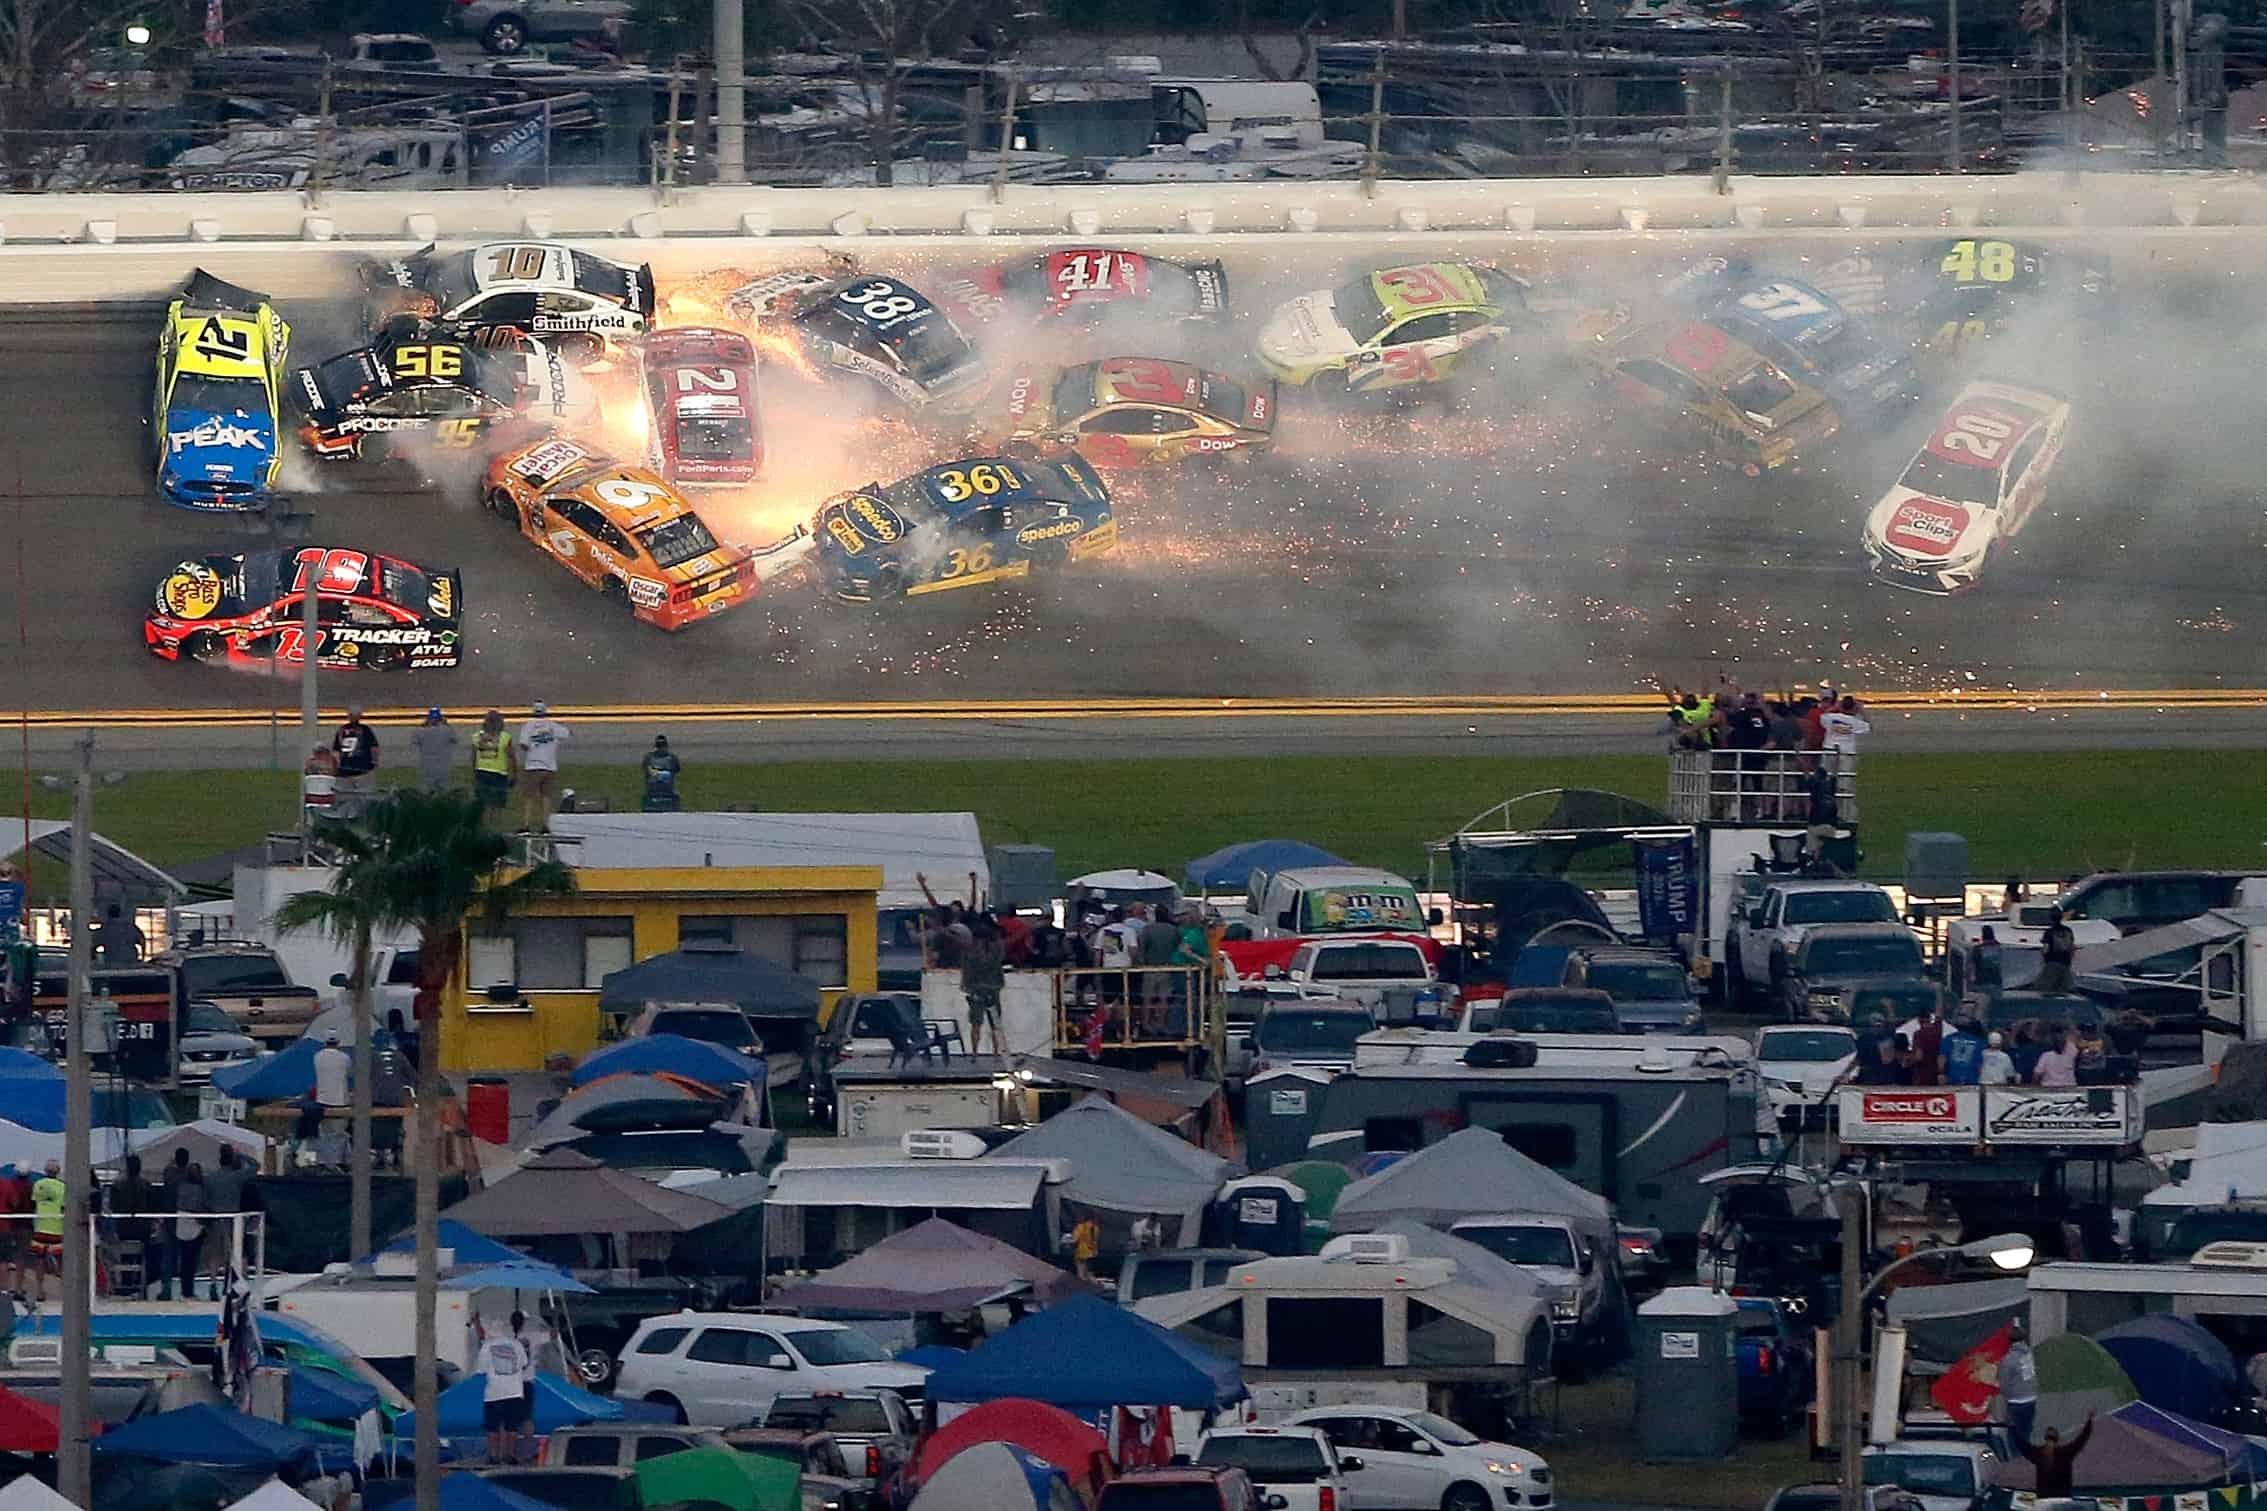 Big crash in the Daytona 500 at Daytona International Speedway - NASCAR Cup Series